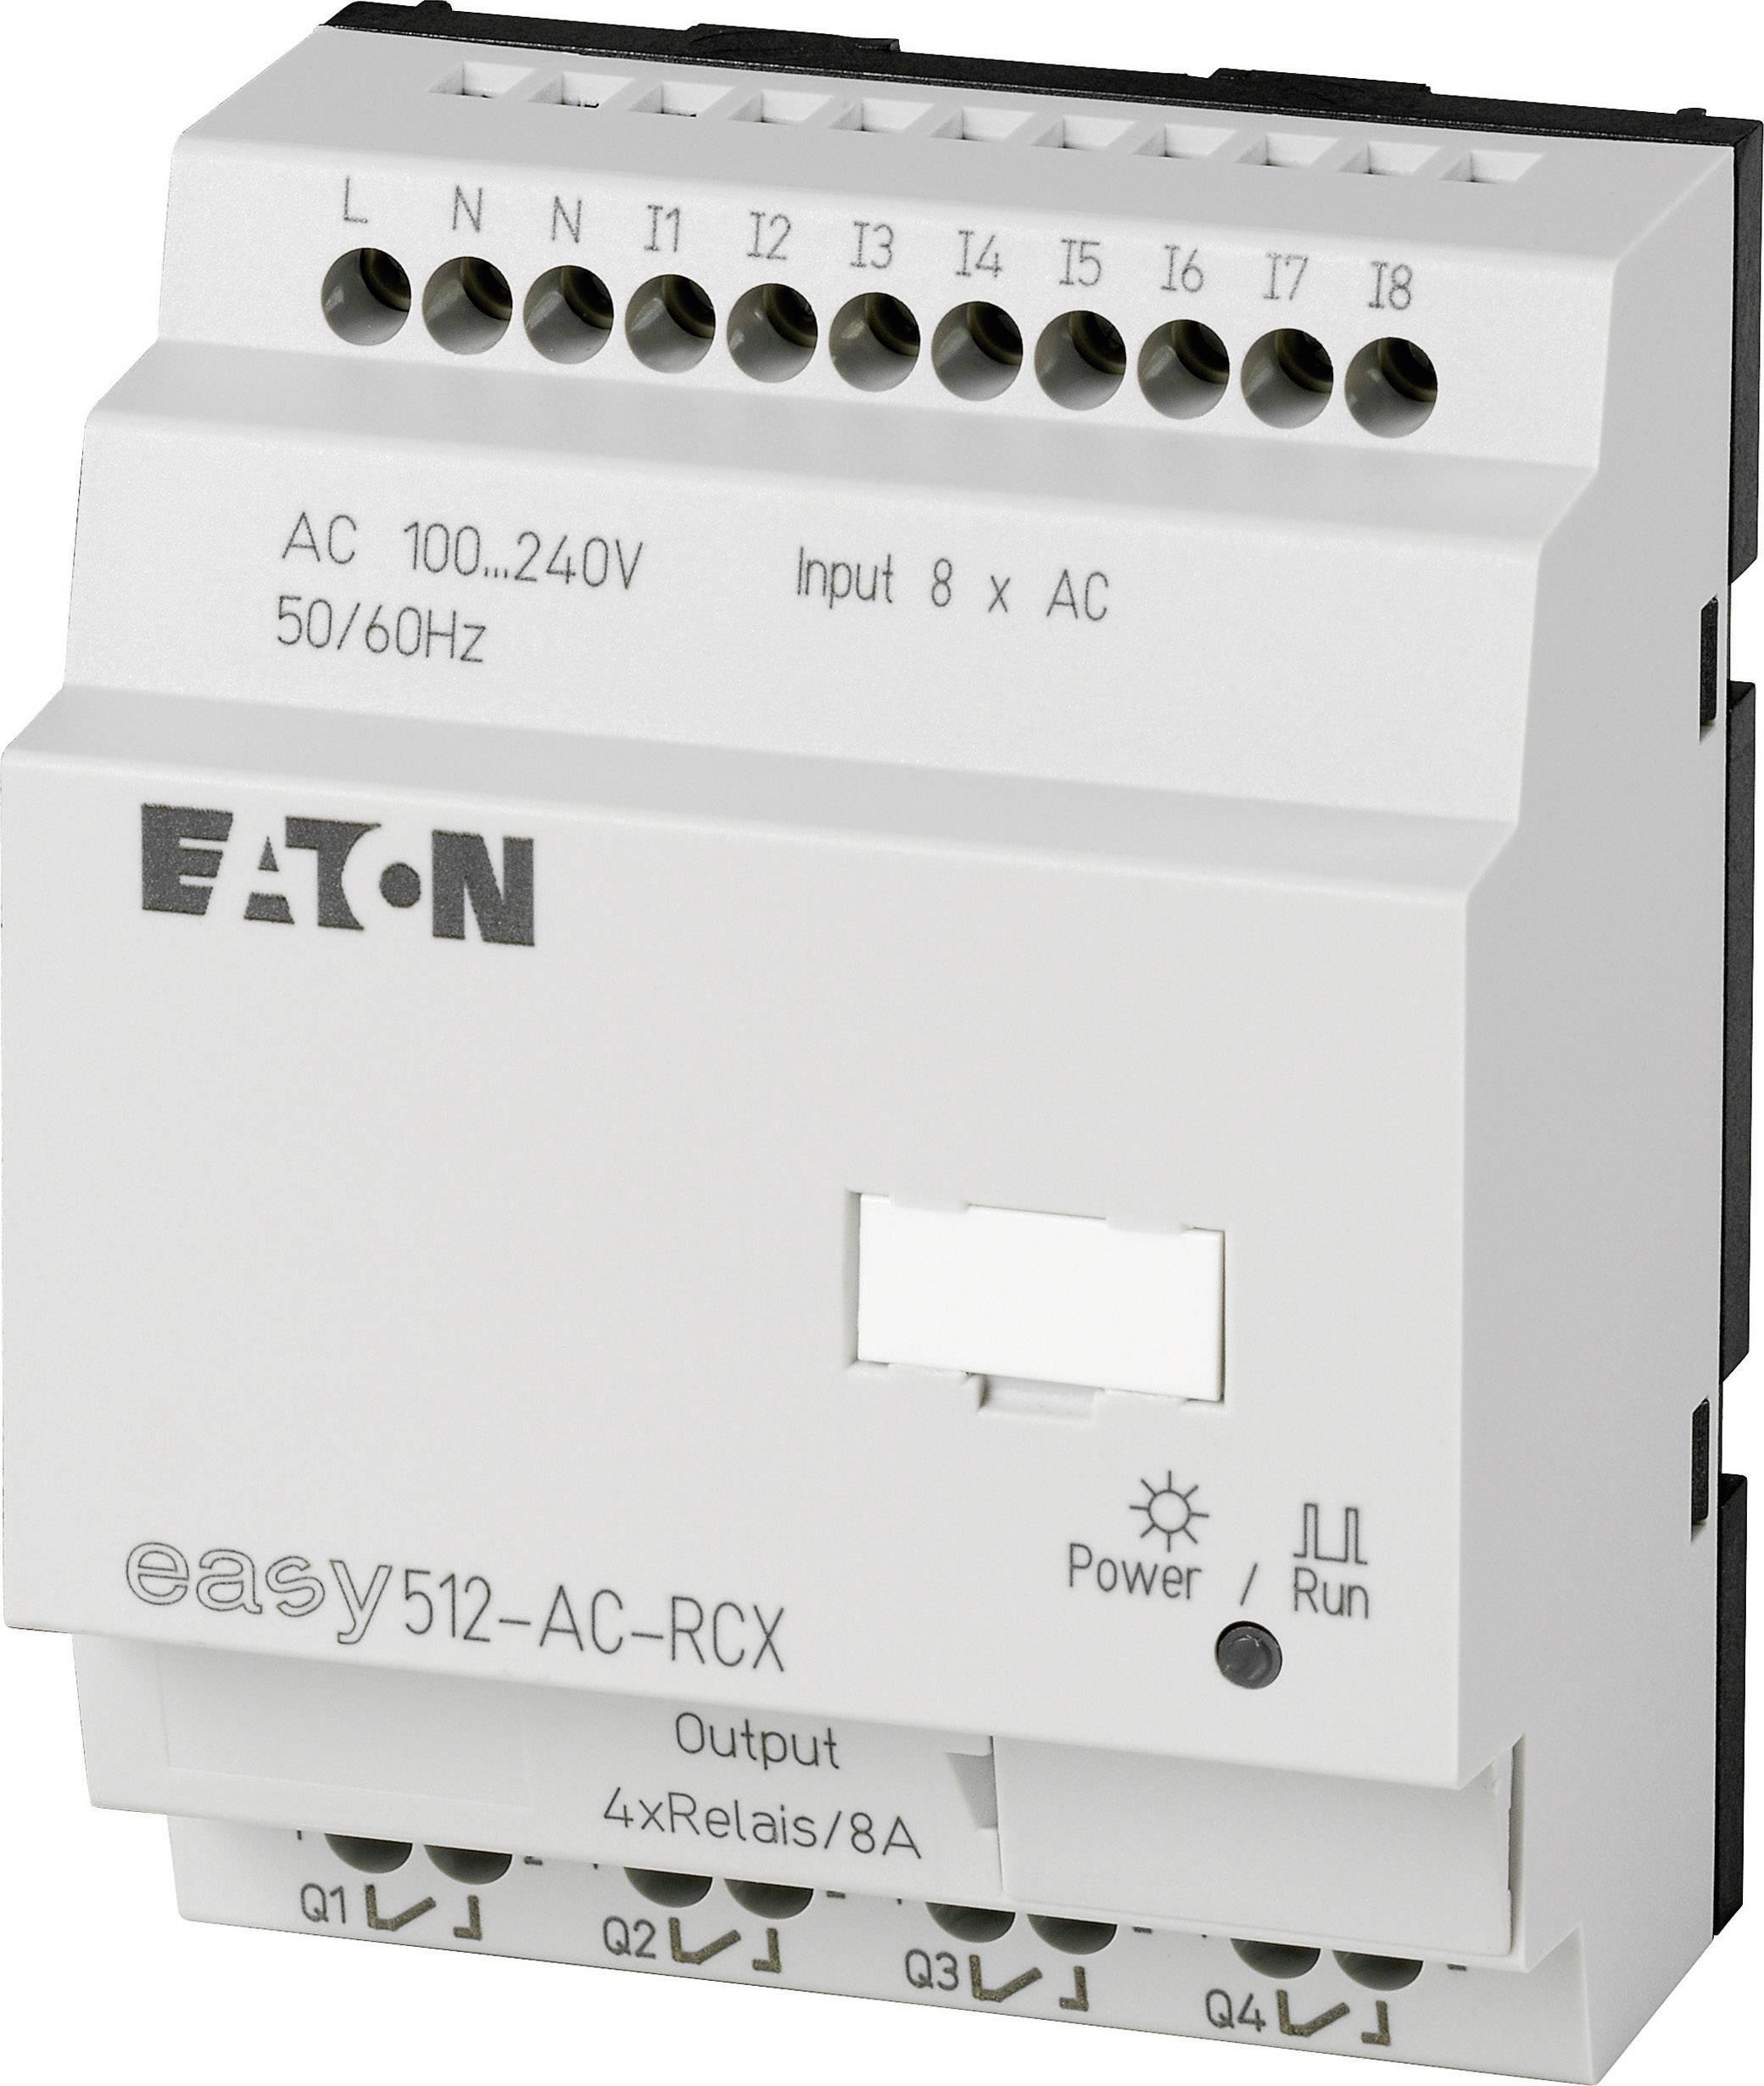 Riadiacimodul Eaton easy 512-AC-RCX 274105, 115 V/AC, 230 V/AC